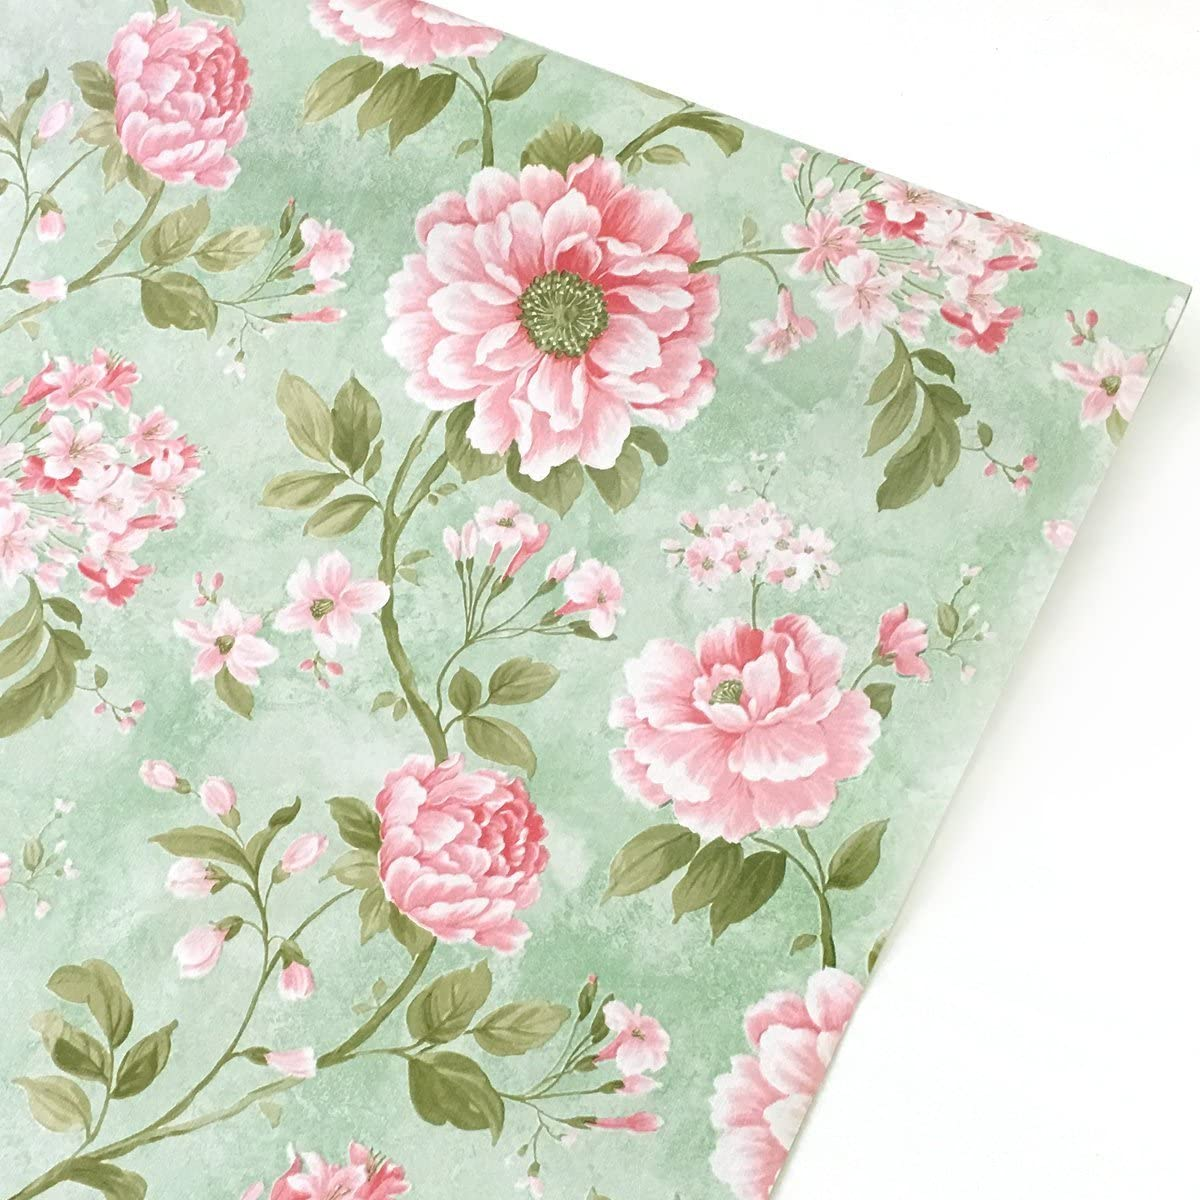 Vintage Flower Stand Liner Dresser Drawer Sticker PVC autoadhesivo Papel pintado autoadhesivo Gabinete Mesa Contacto Papel Oro Rosa